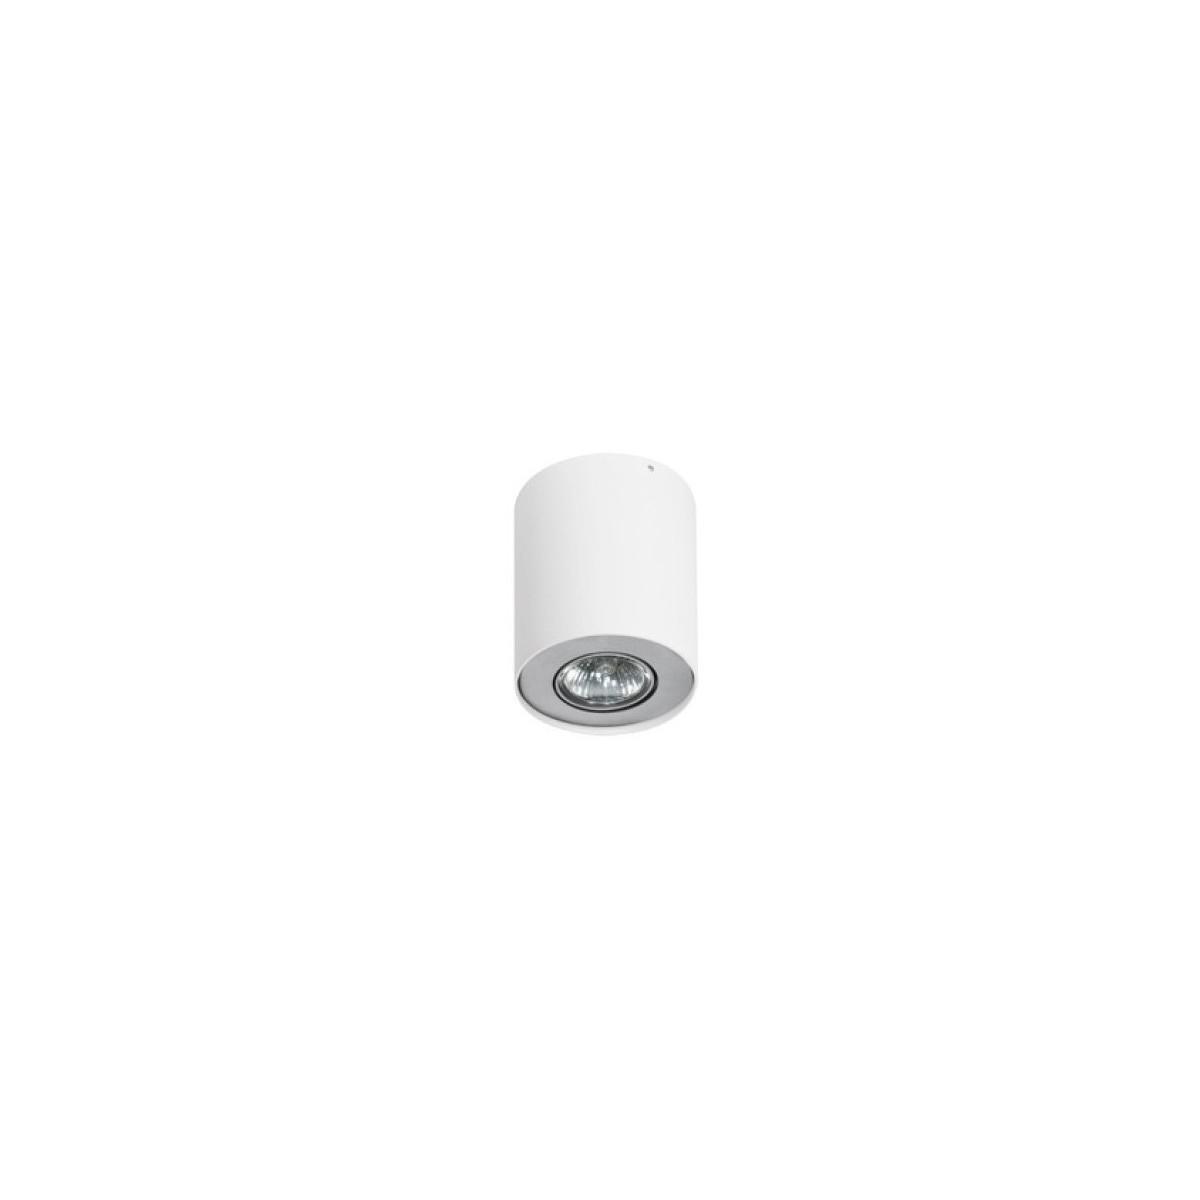 Azzardo NEOS 1 WHITE/ALUMINIUM 1xGU10 Natynkowa Biały/Aluminium AZ0606